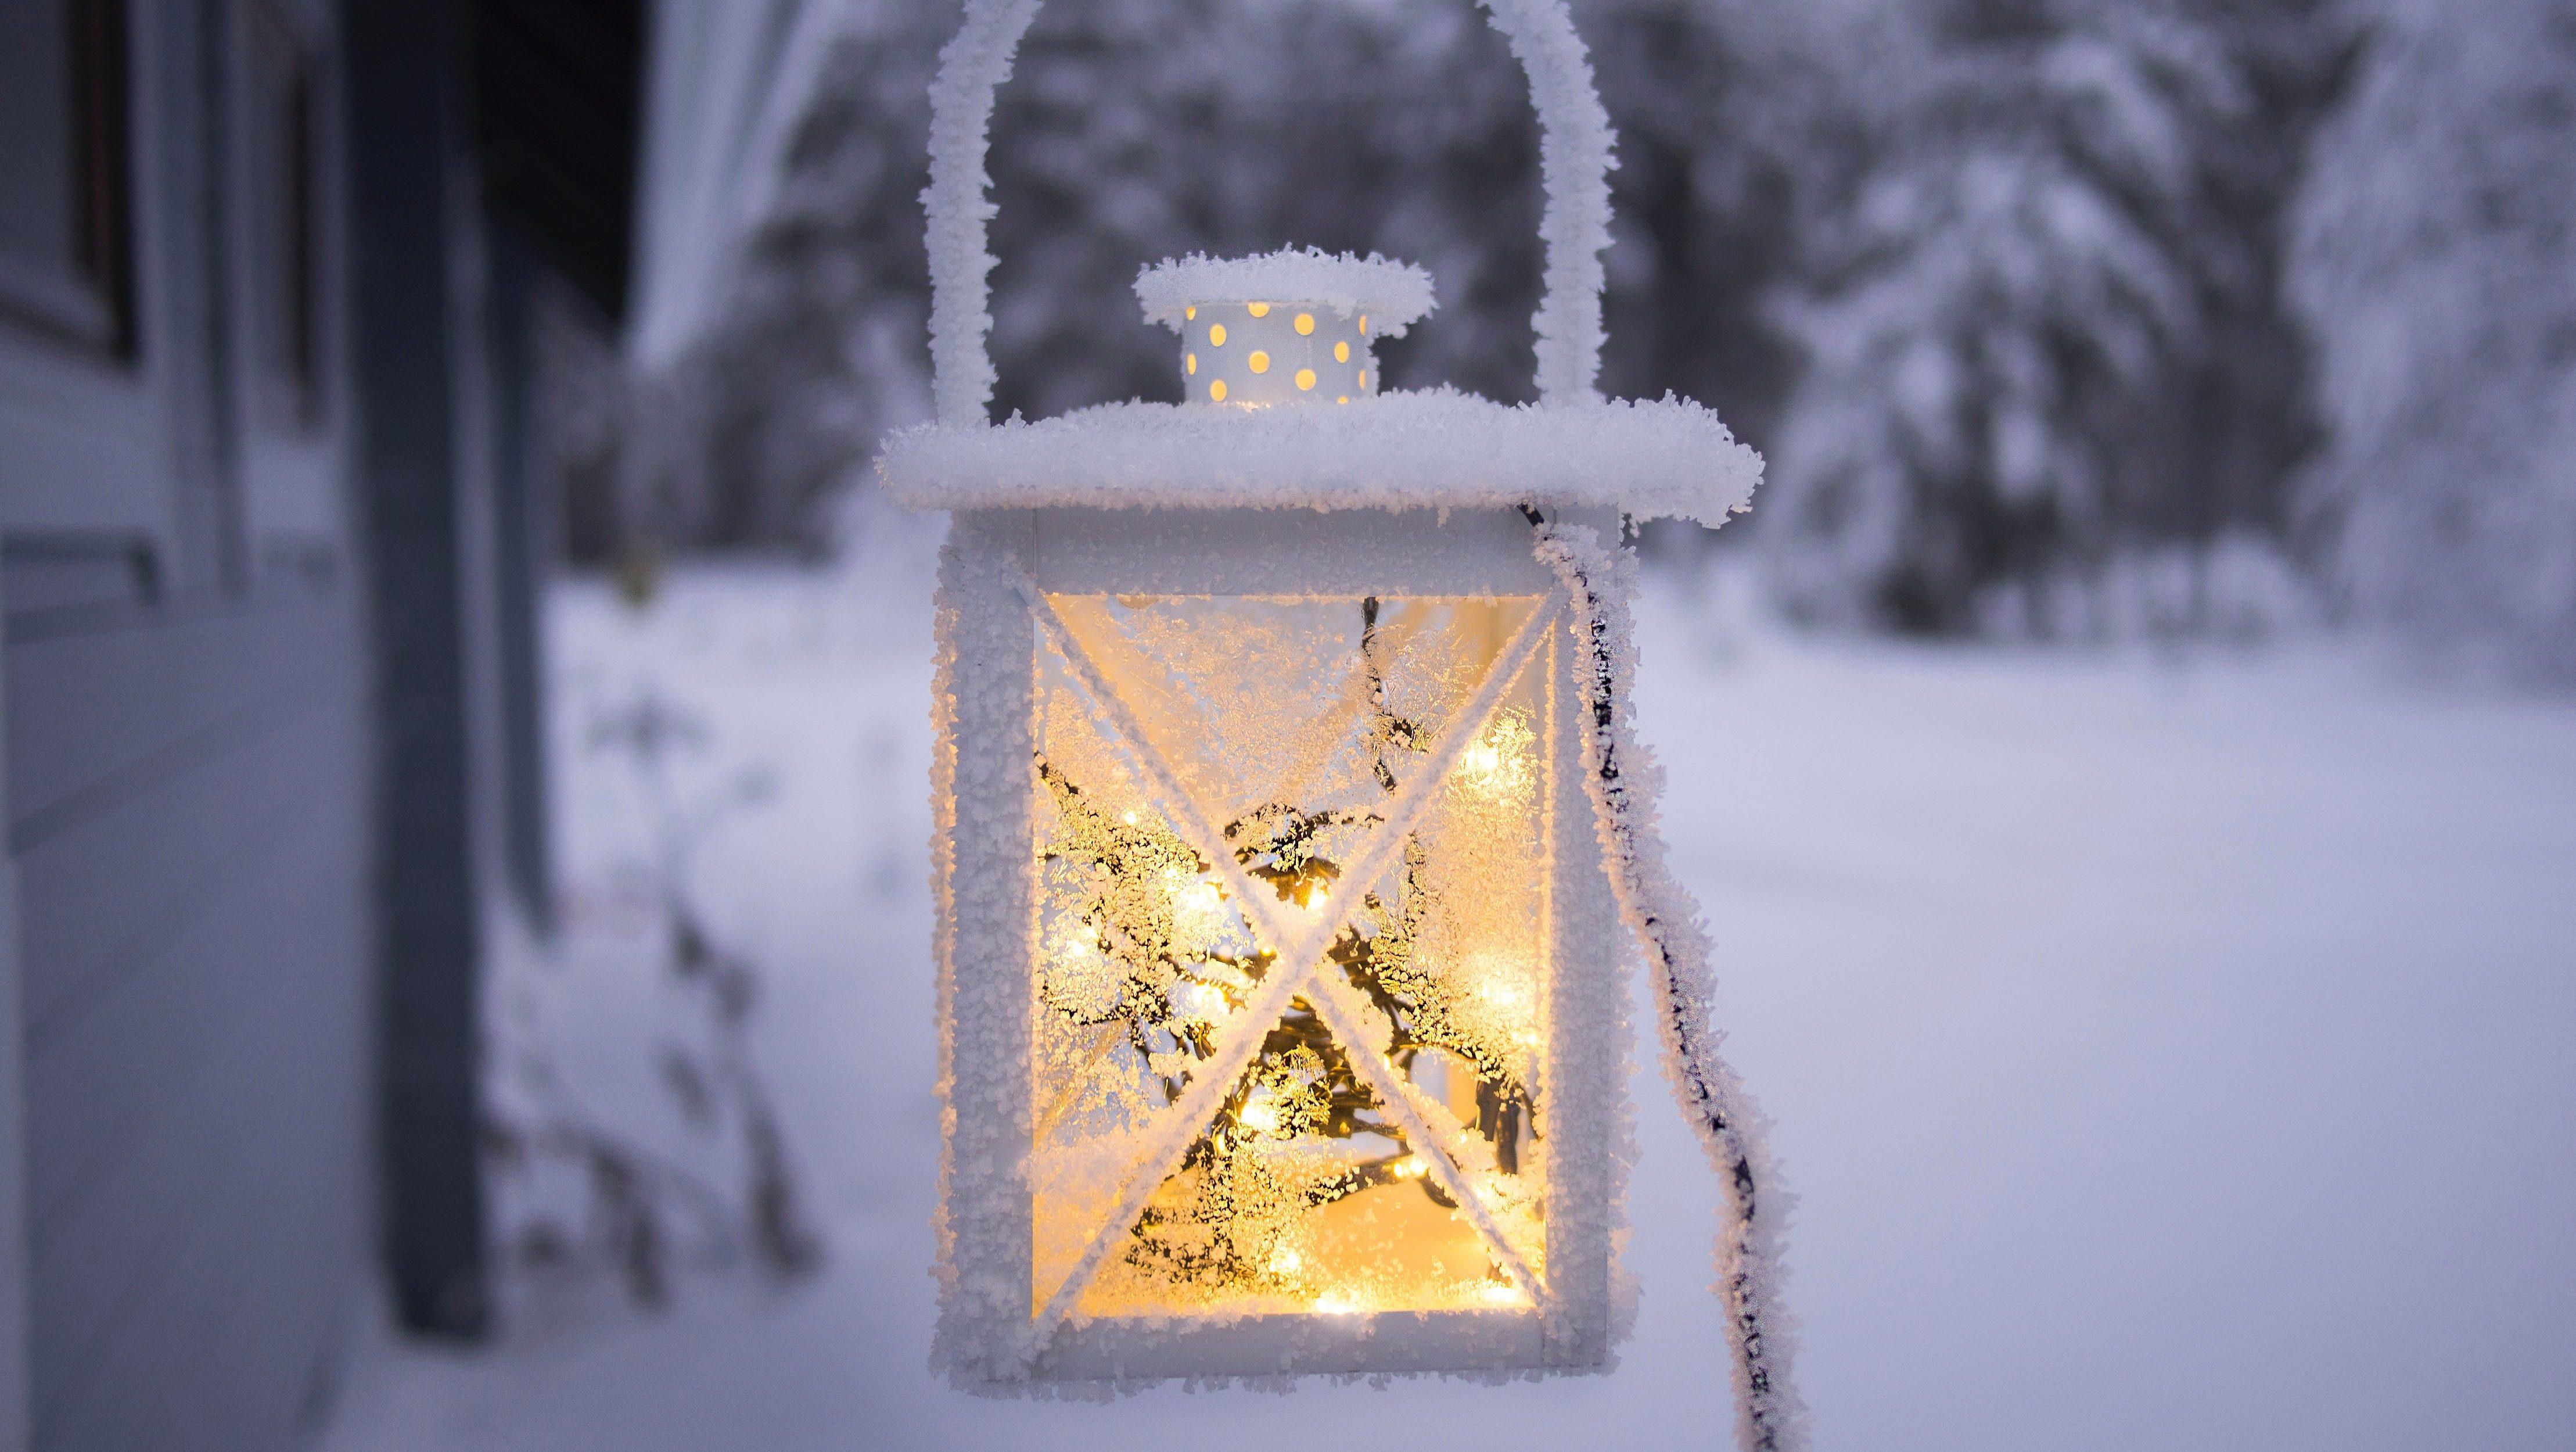 A lantern in snow